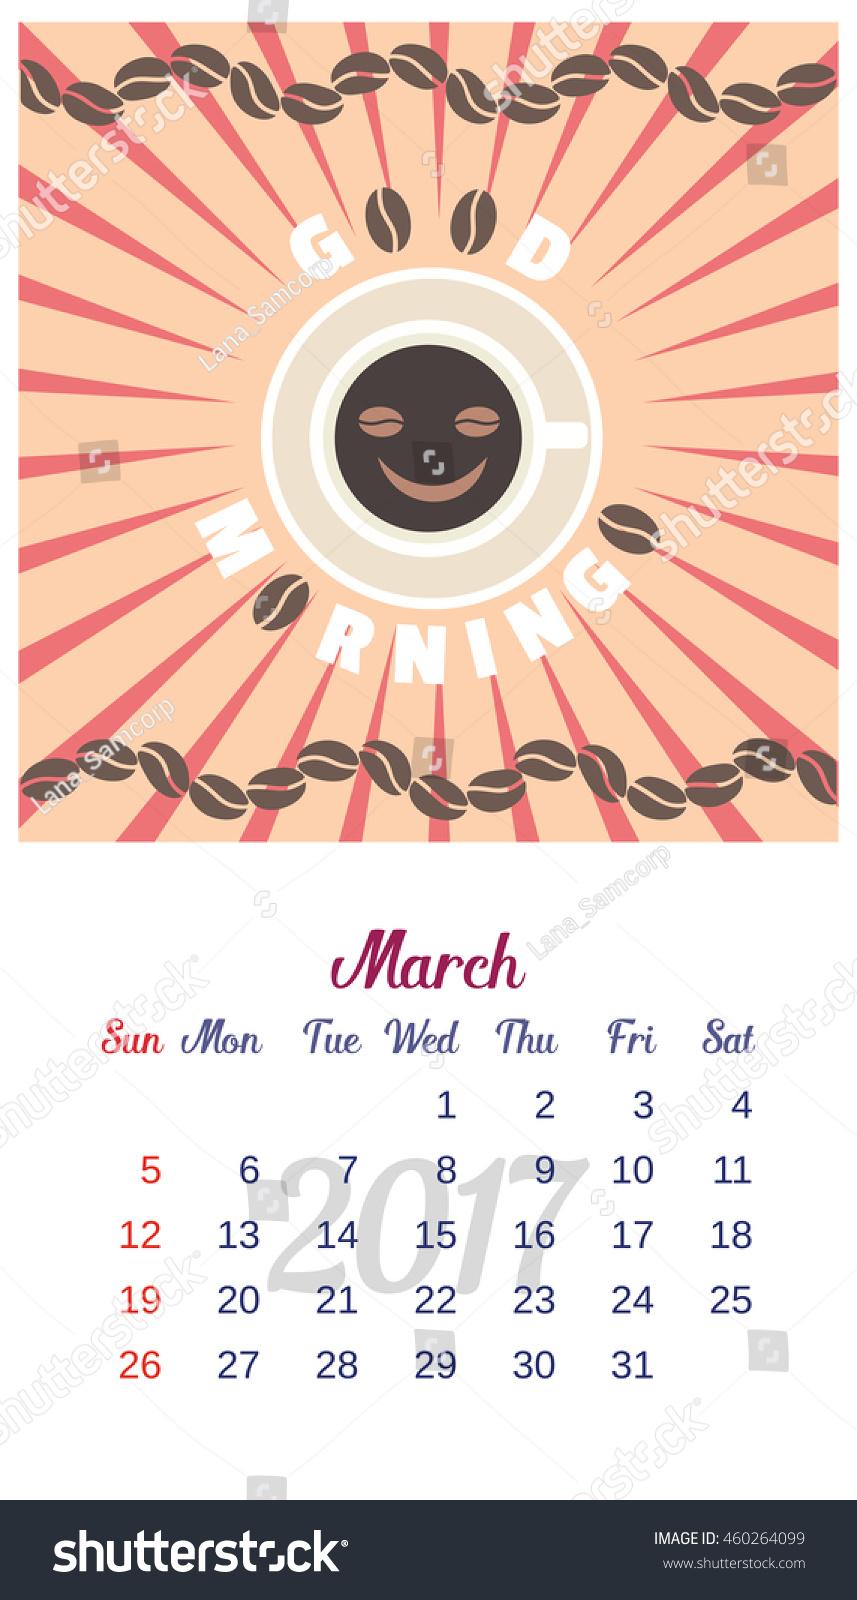 edit calendar template